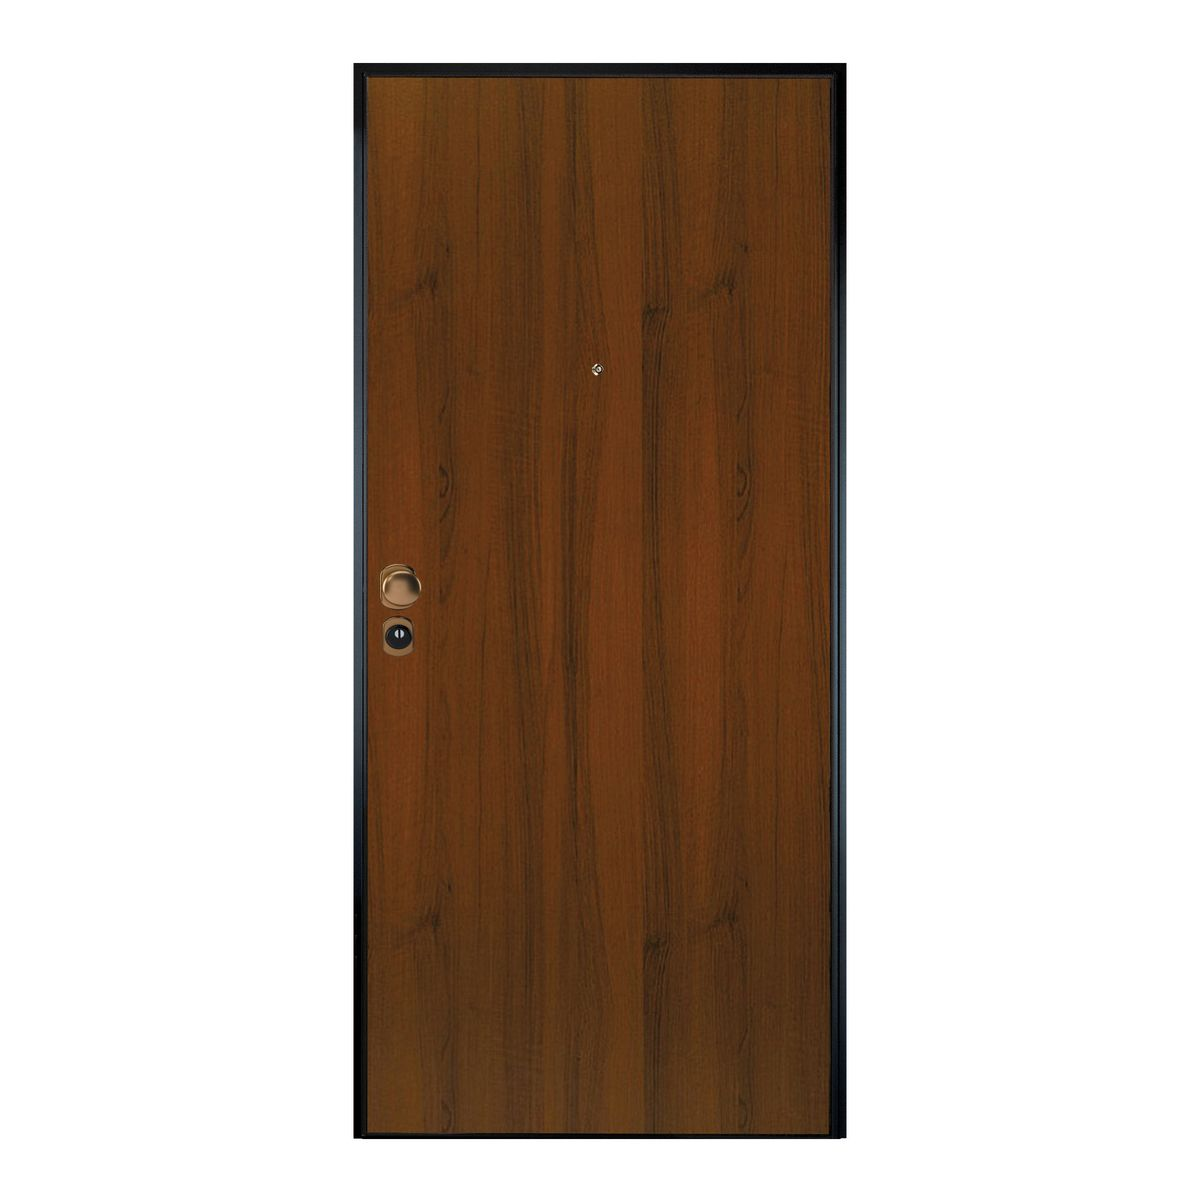 Porta soffietto leroy merlin bagnobox doccia scorrevole - Carta da parati per porte leroy merlin ...